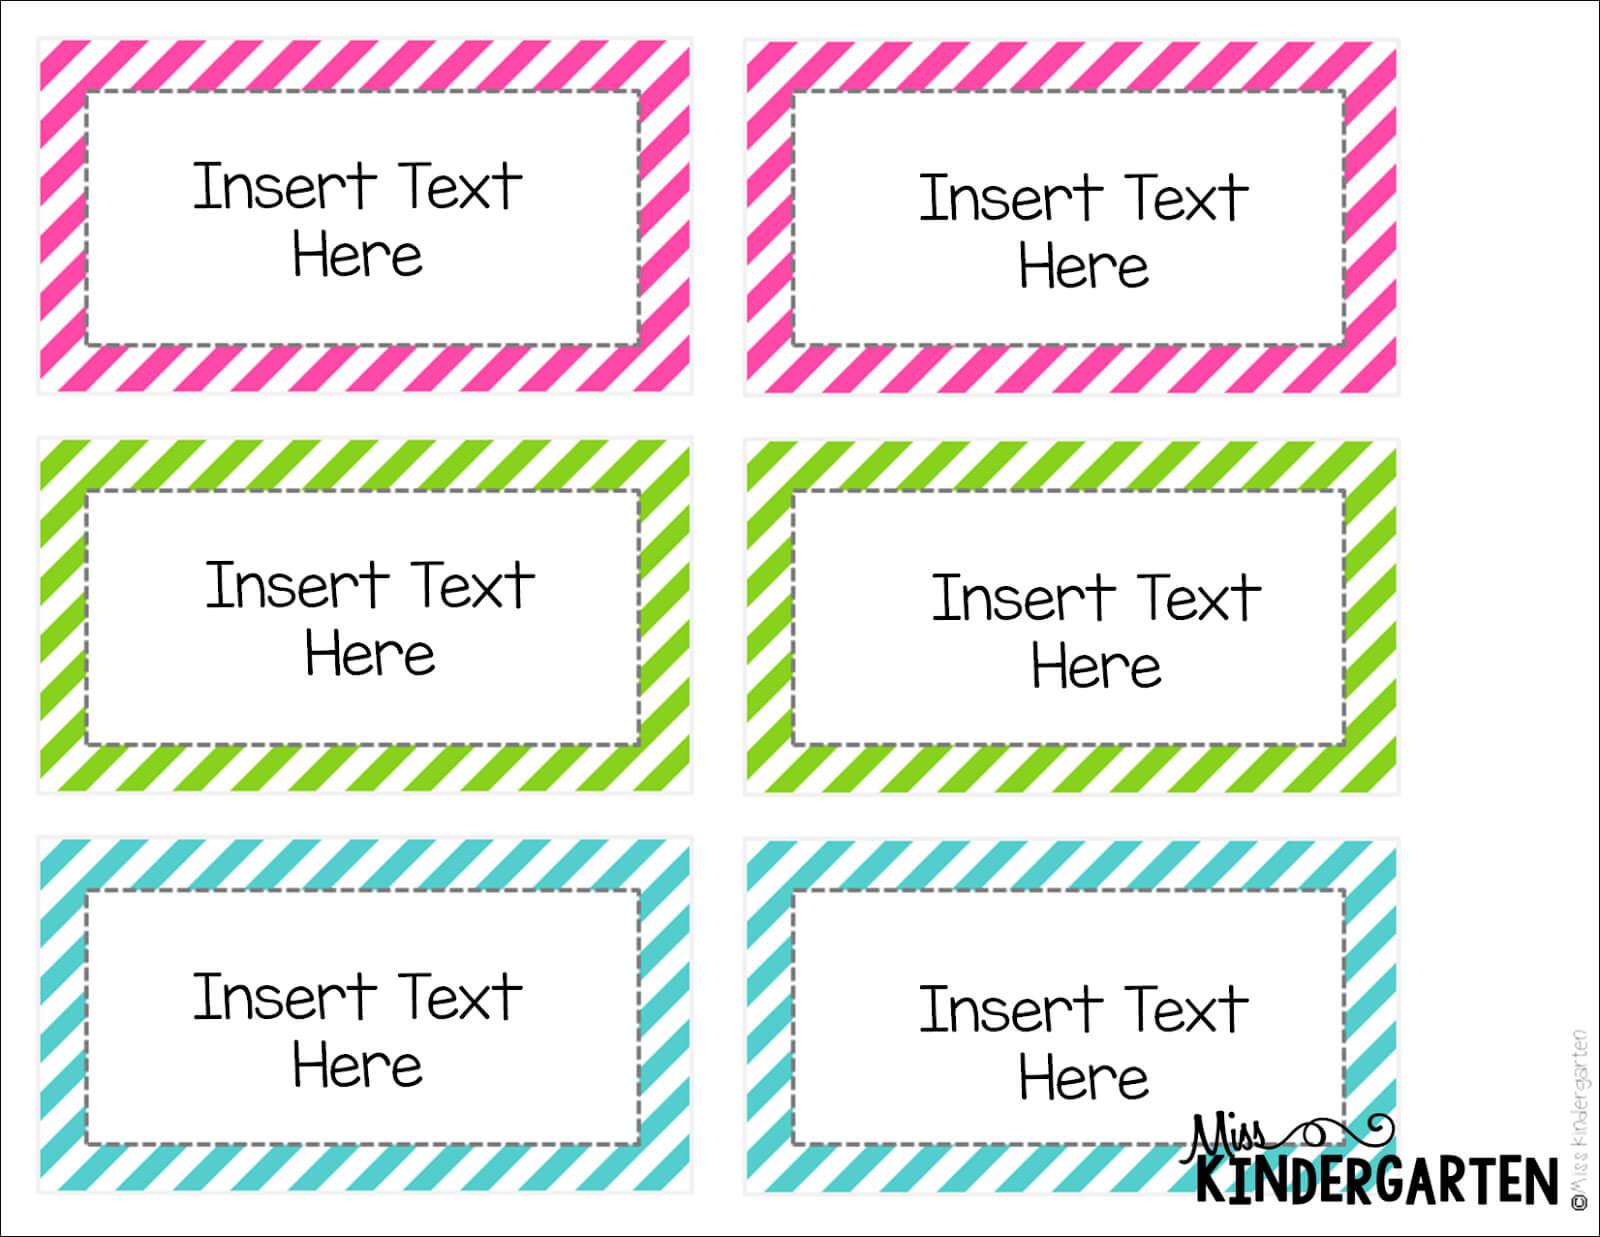 Editable Word Wall Templates! - Miss Kindergarten In Blank Word Wall Template Free